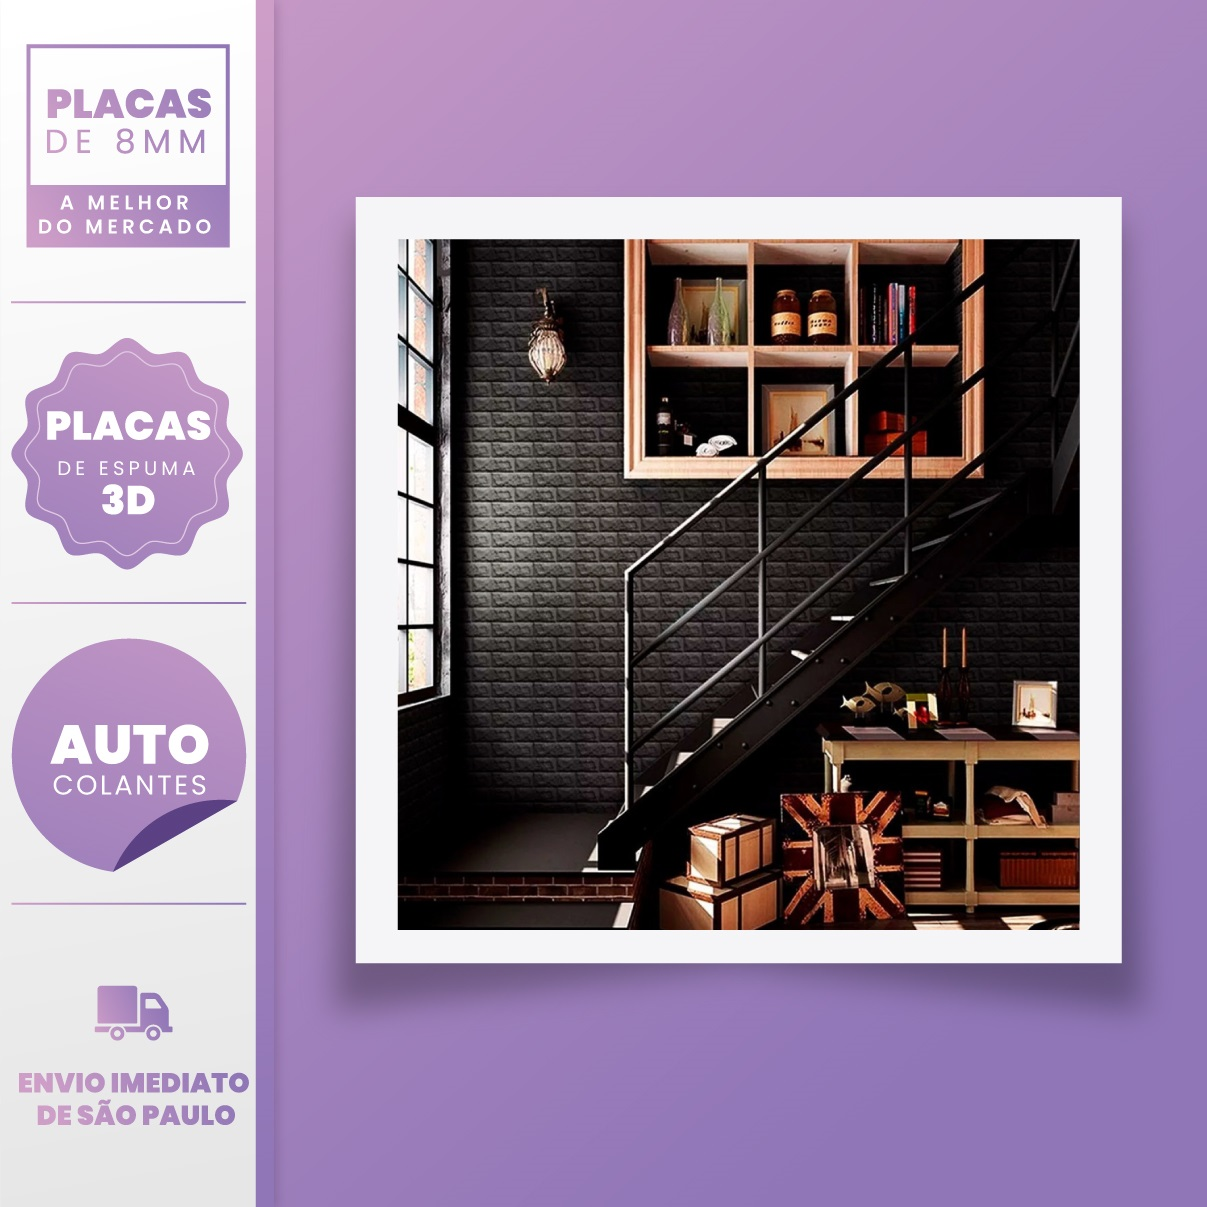 PLACA 3D ESPUMA TIJOLO CLASSICO PRETO 70X77 8MM